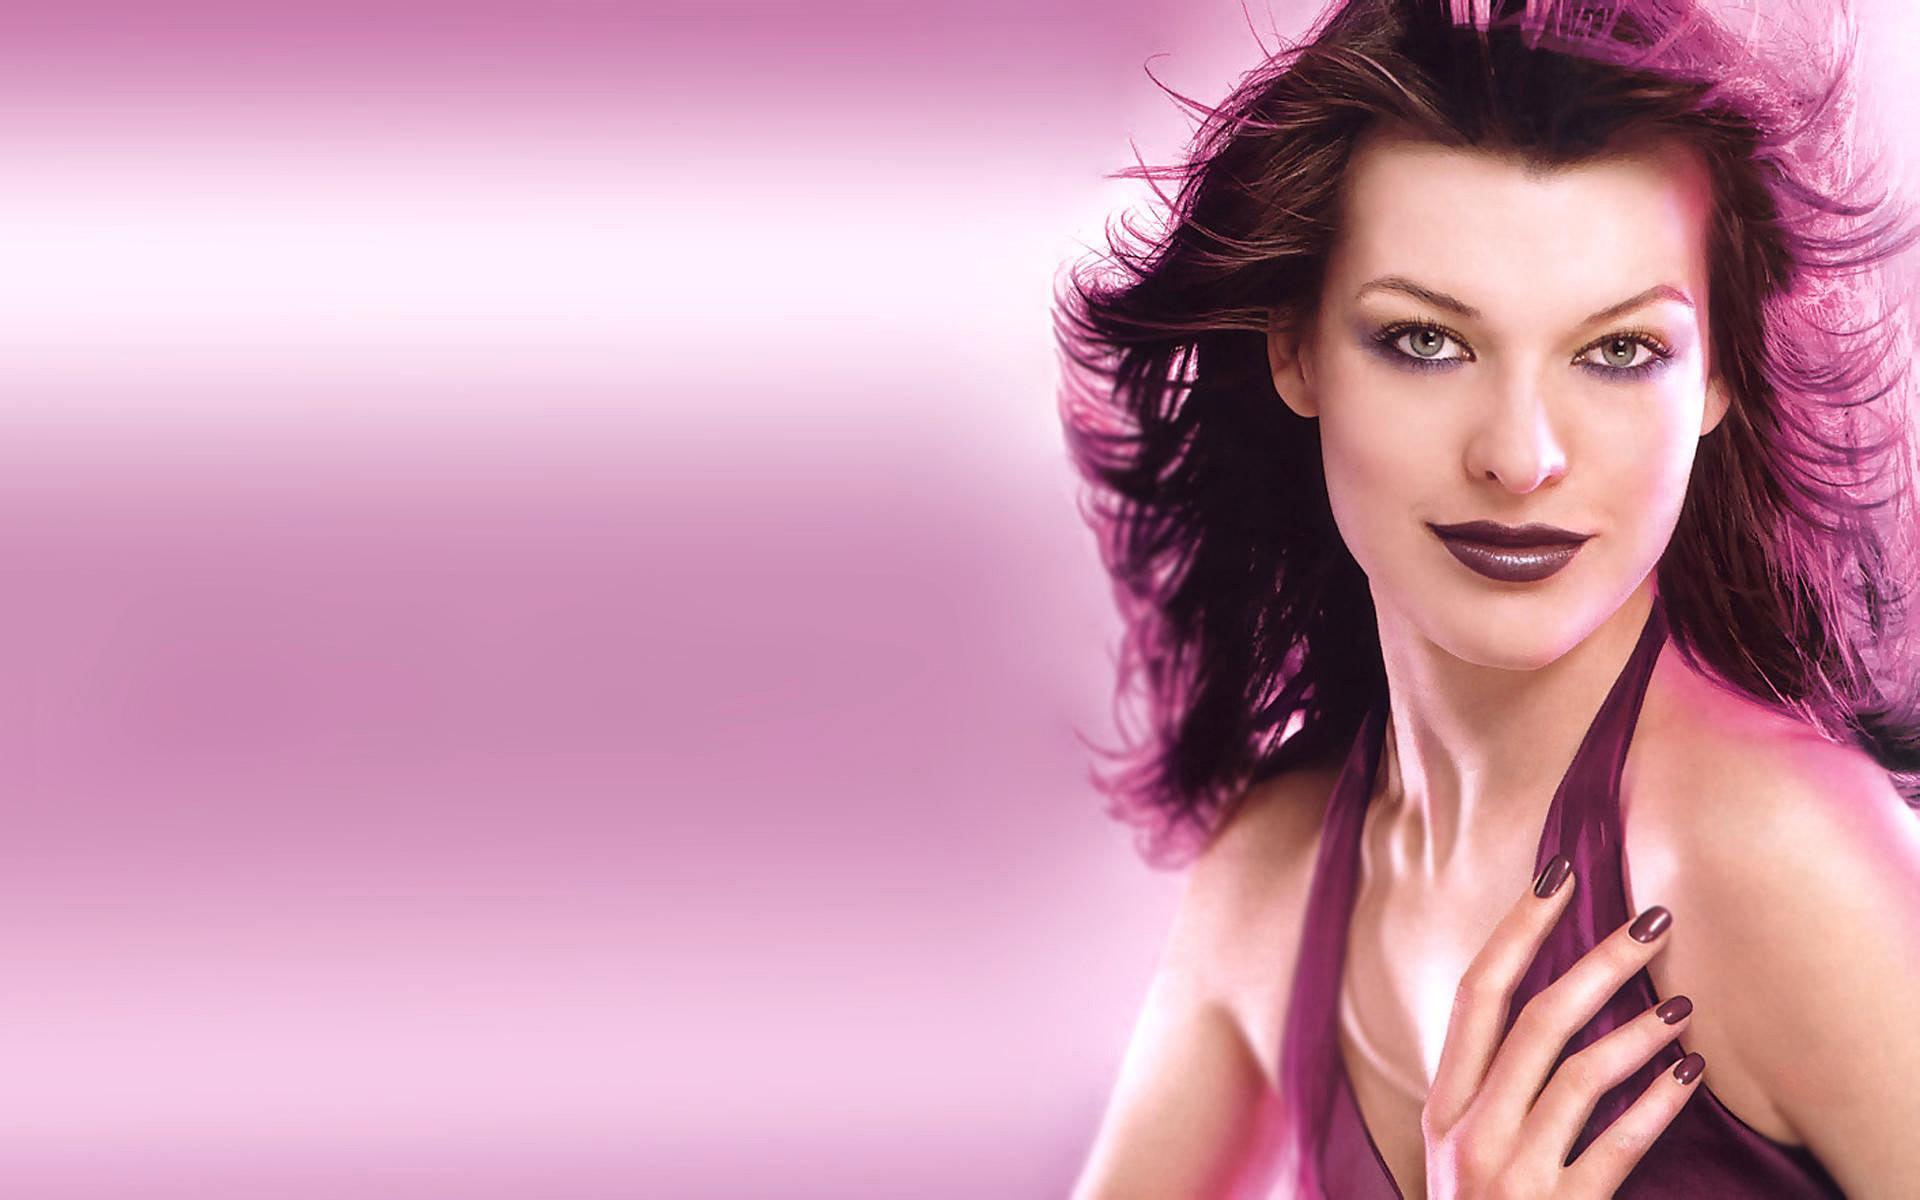 Milla Jovovich actress photo